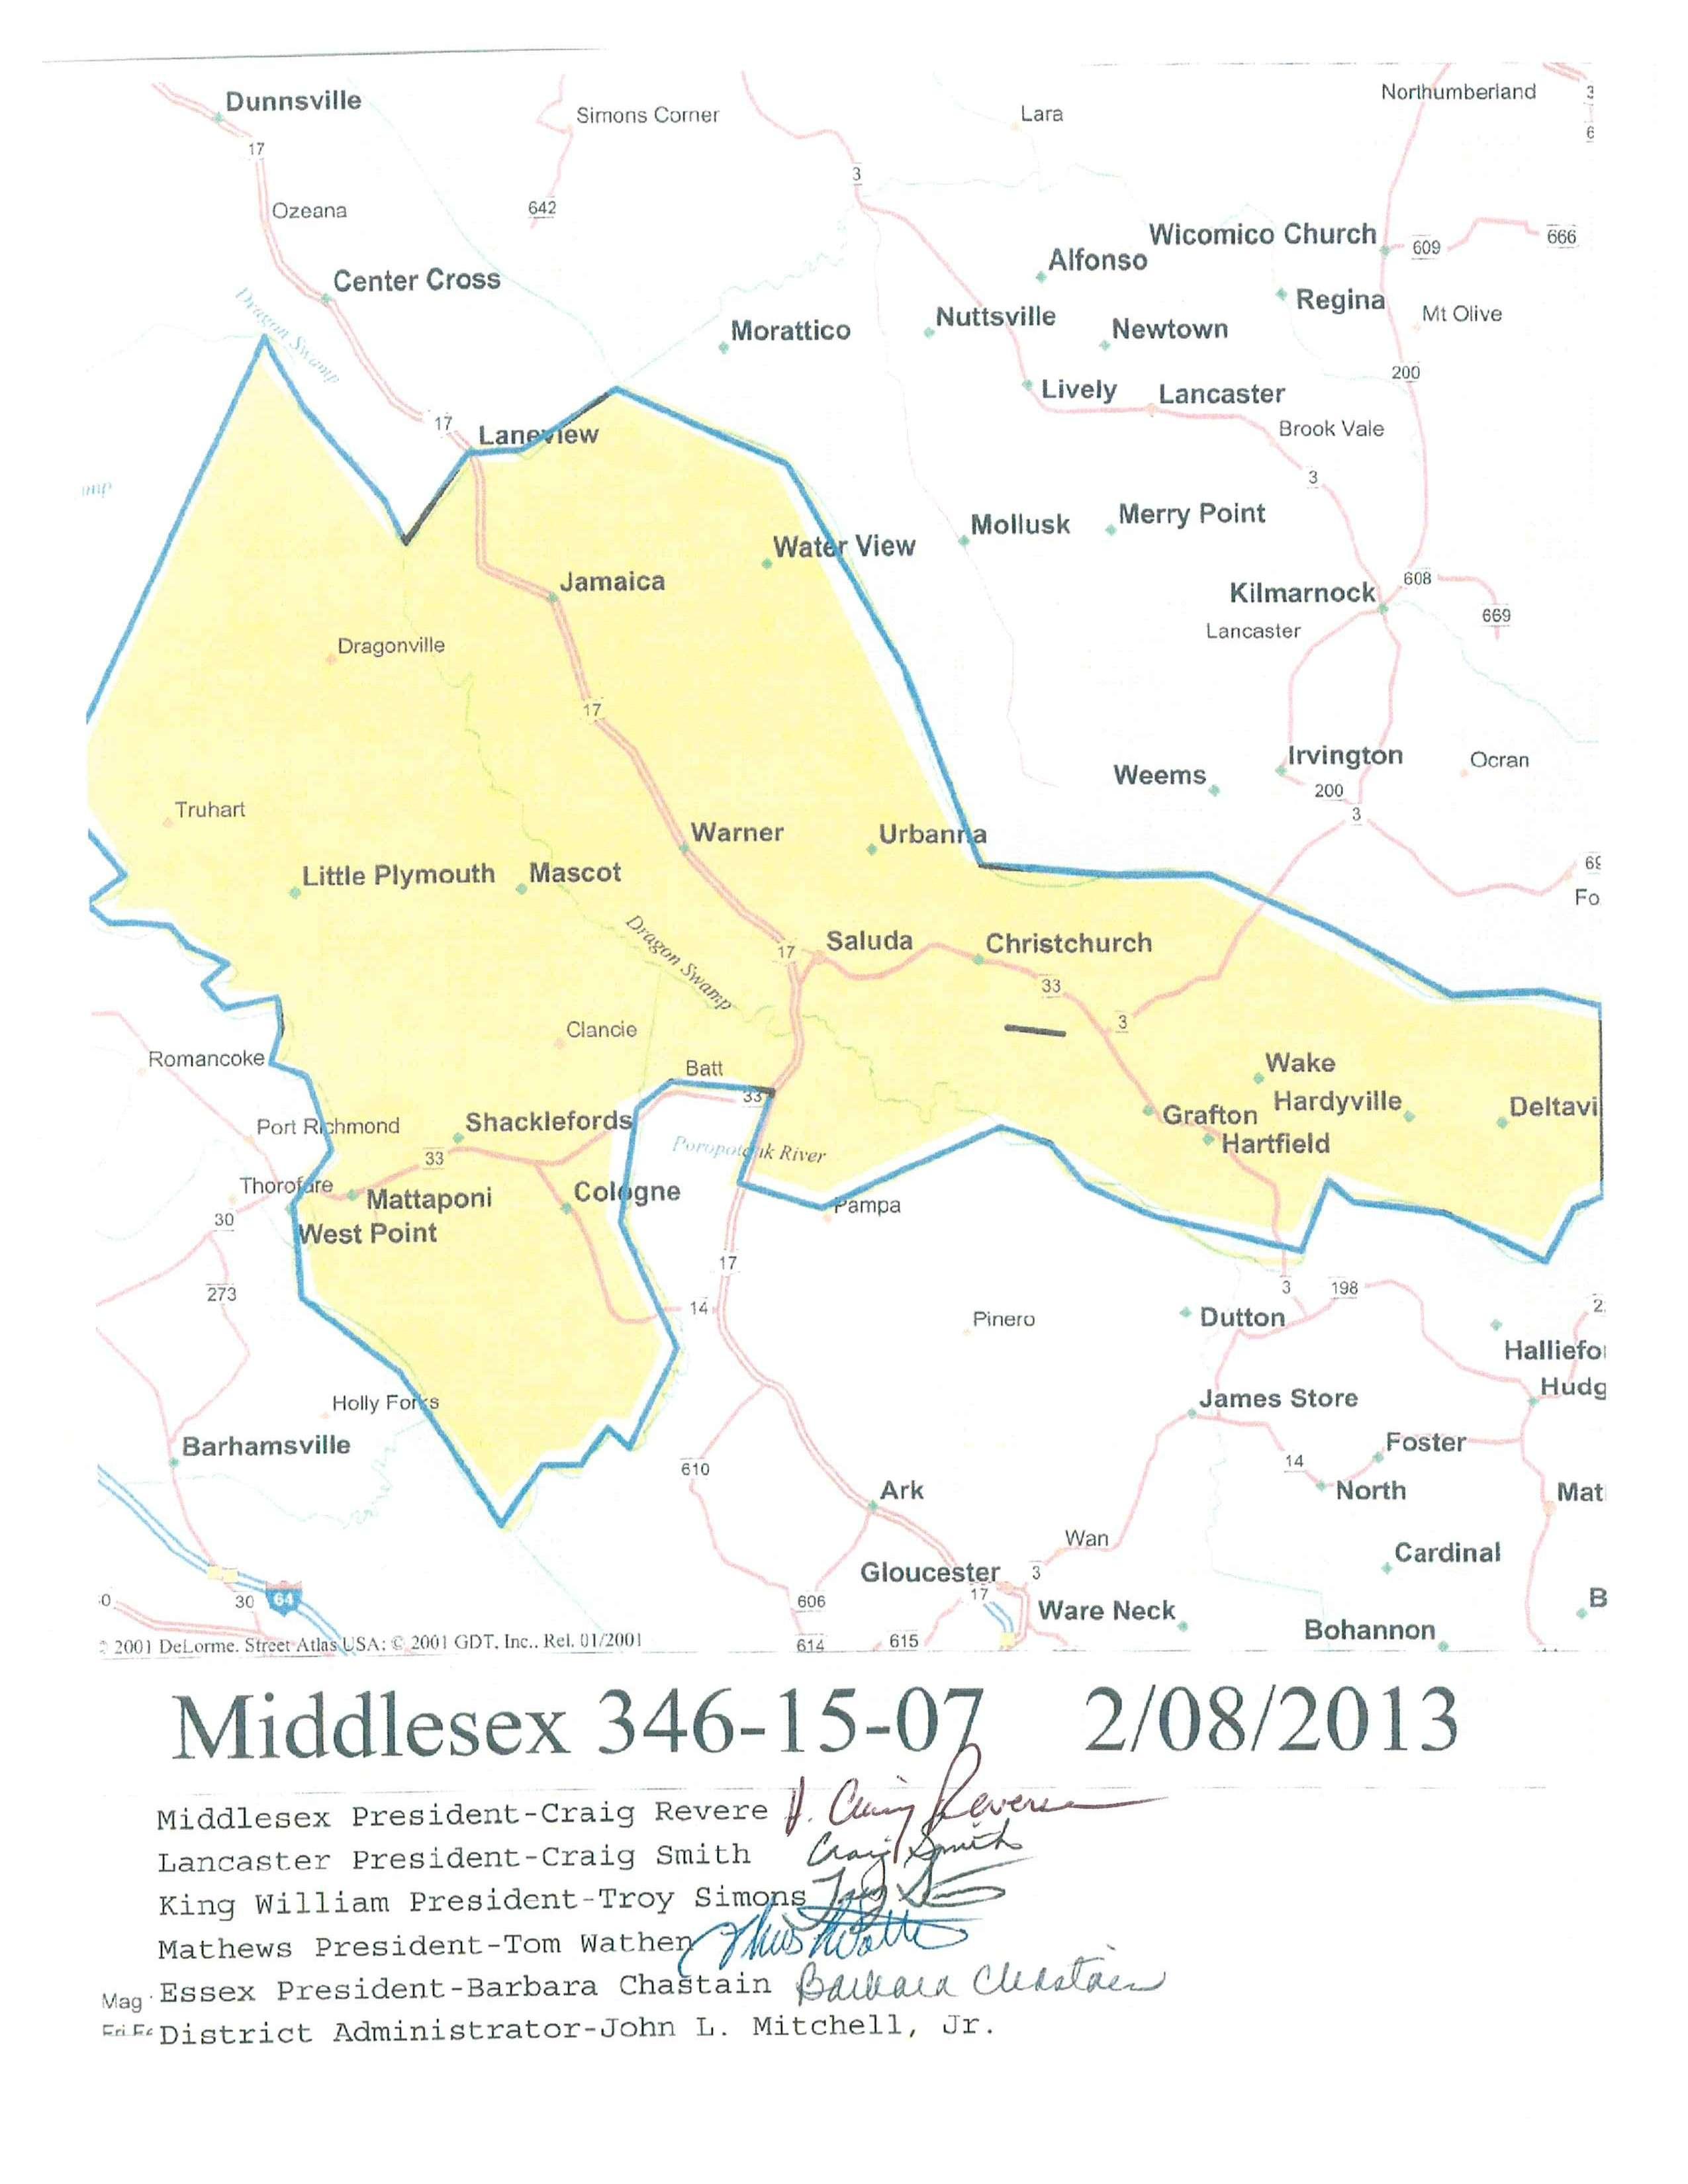 2013-Middlesex.jpg